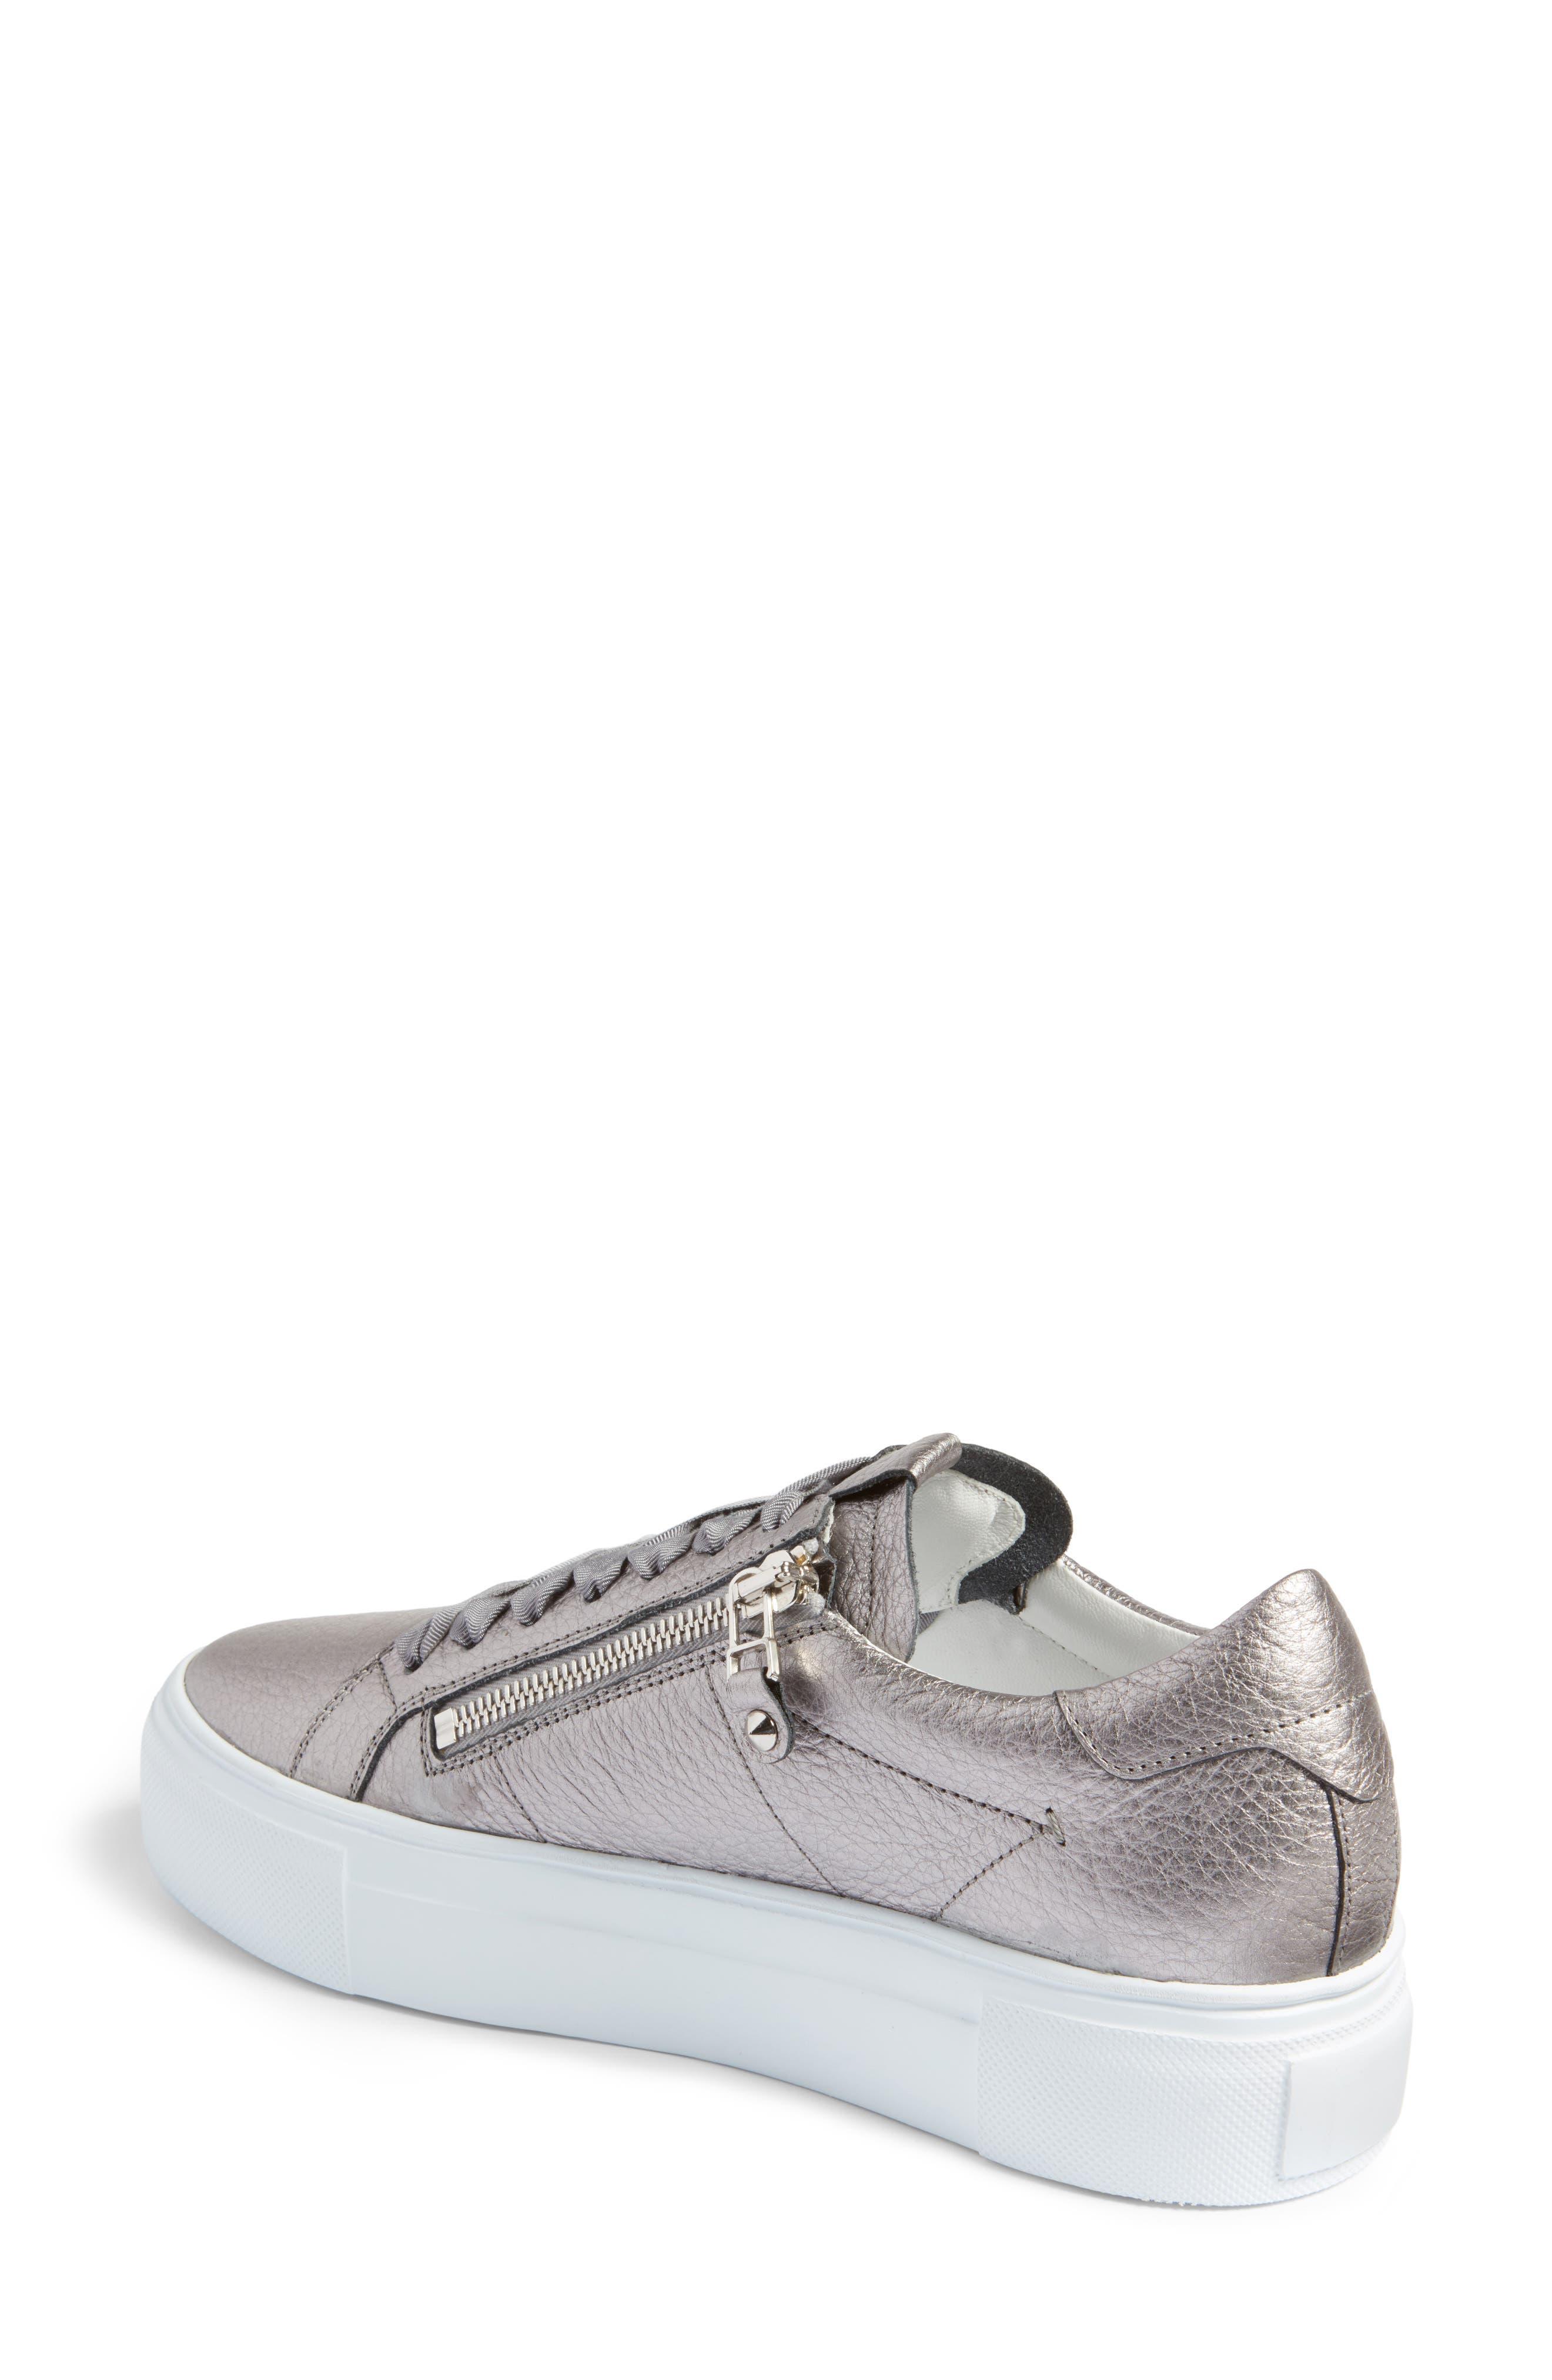 Alternate Image 2  - Kennel & Schmenger Big Low Top Platform Sneaker (Women)